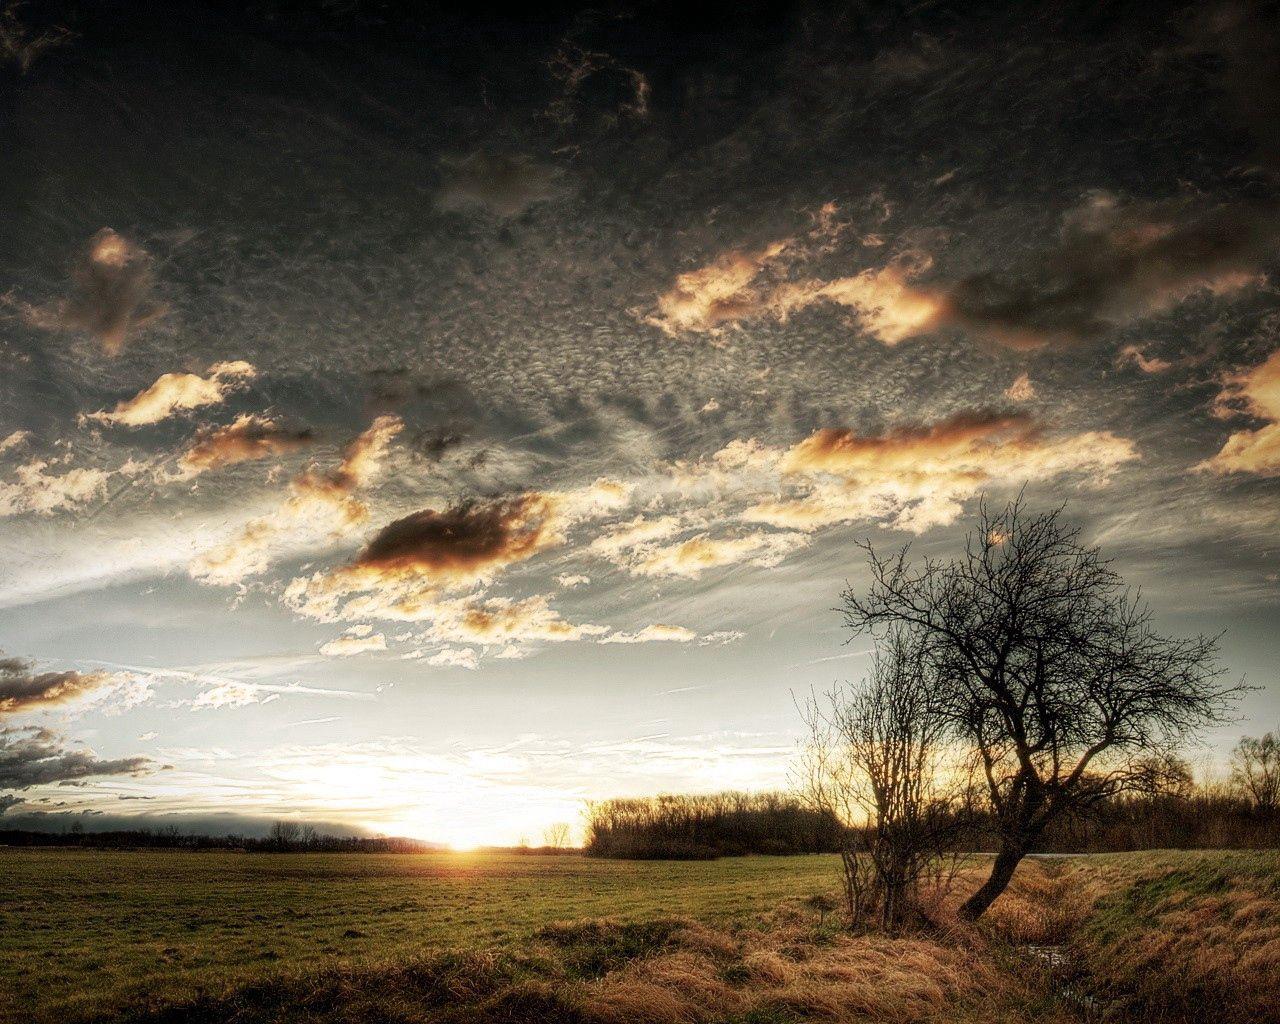 126061 скачать обои Природа, Облака, Небо, Поле, Трава, Дерево, Солнце - заставки и картинки бесплатно